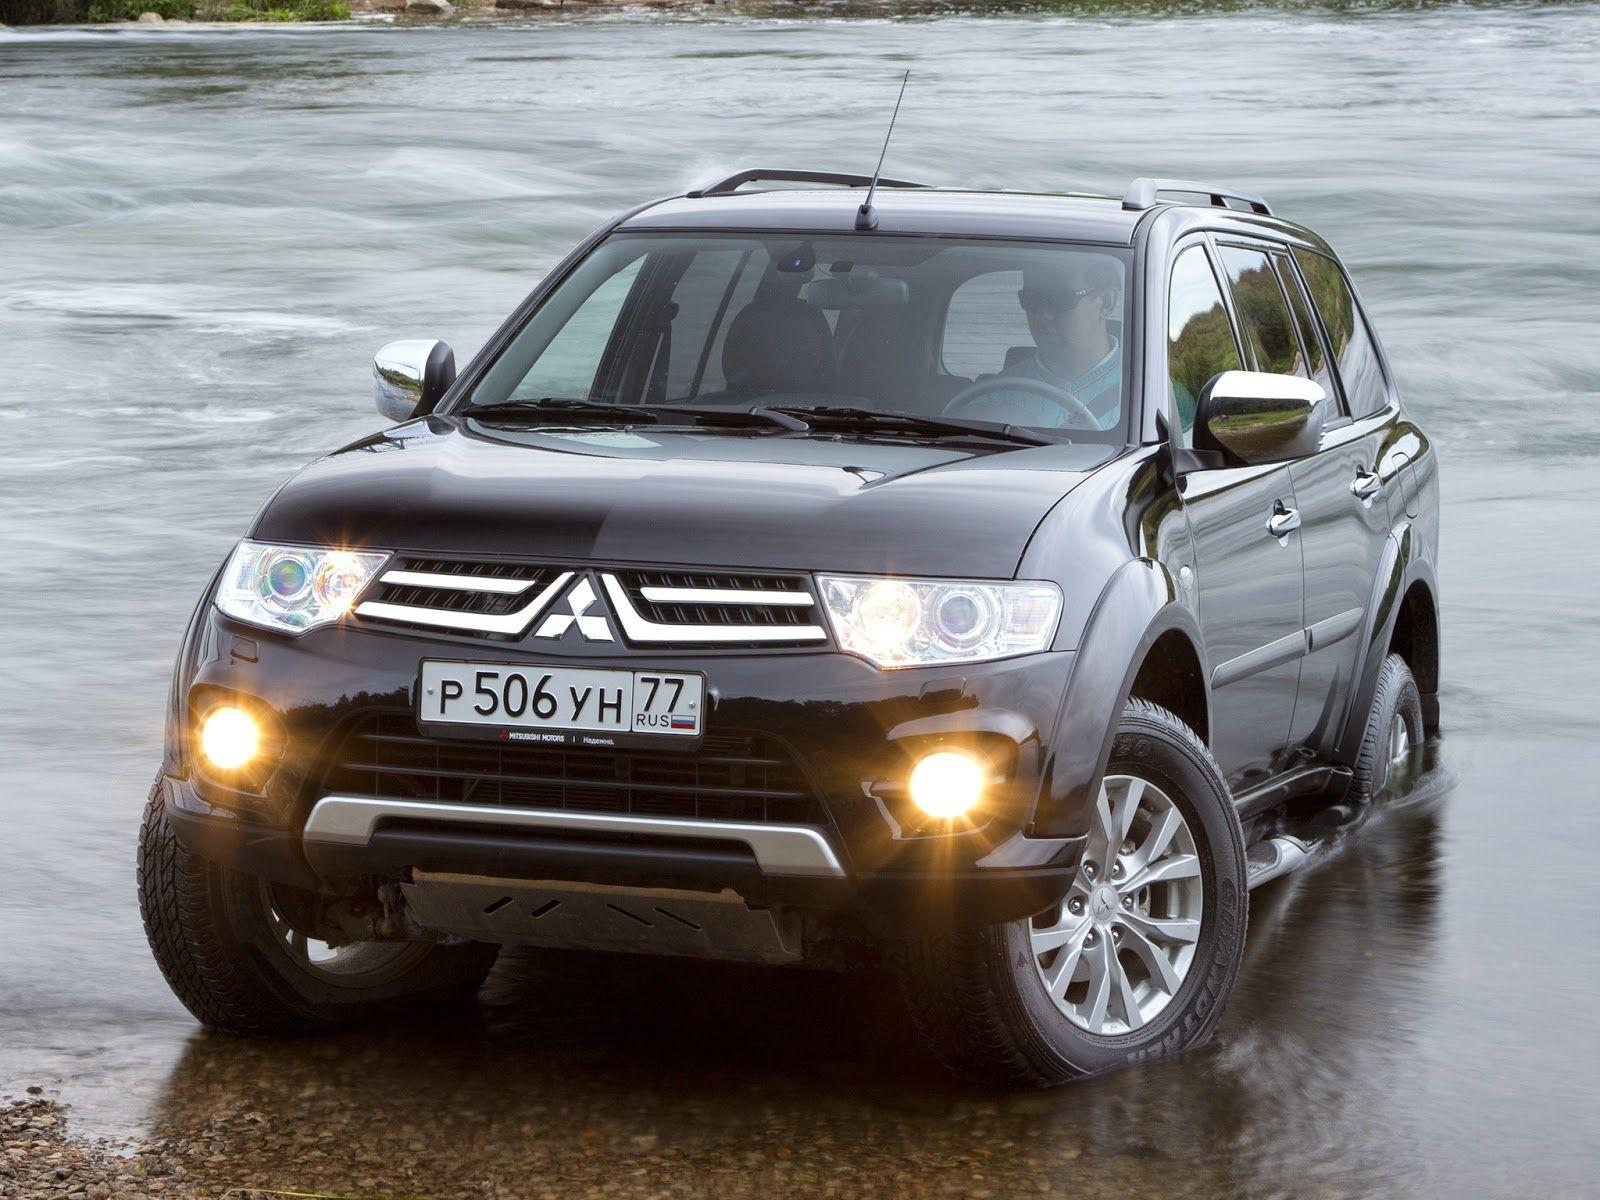 Free #Wallpaper Downloads: #Mitsubishi #Pajero Sport Dakar